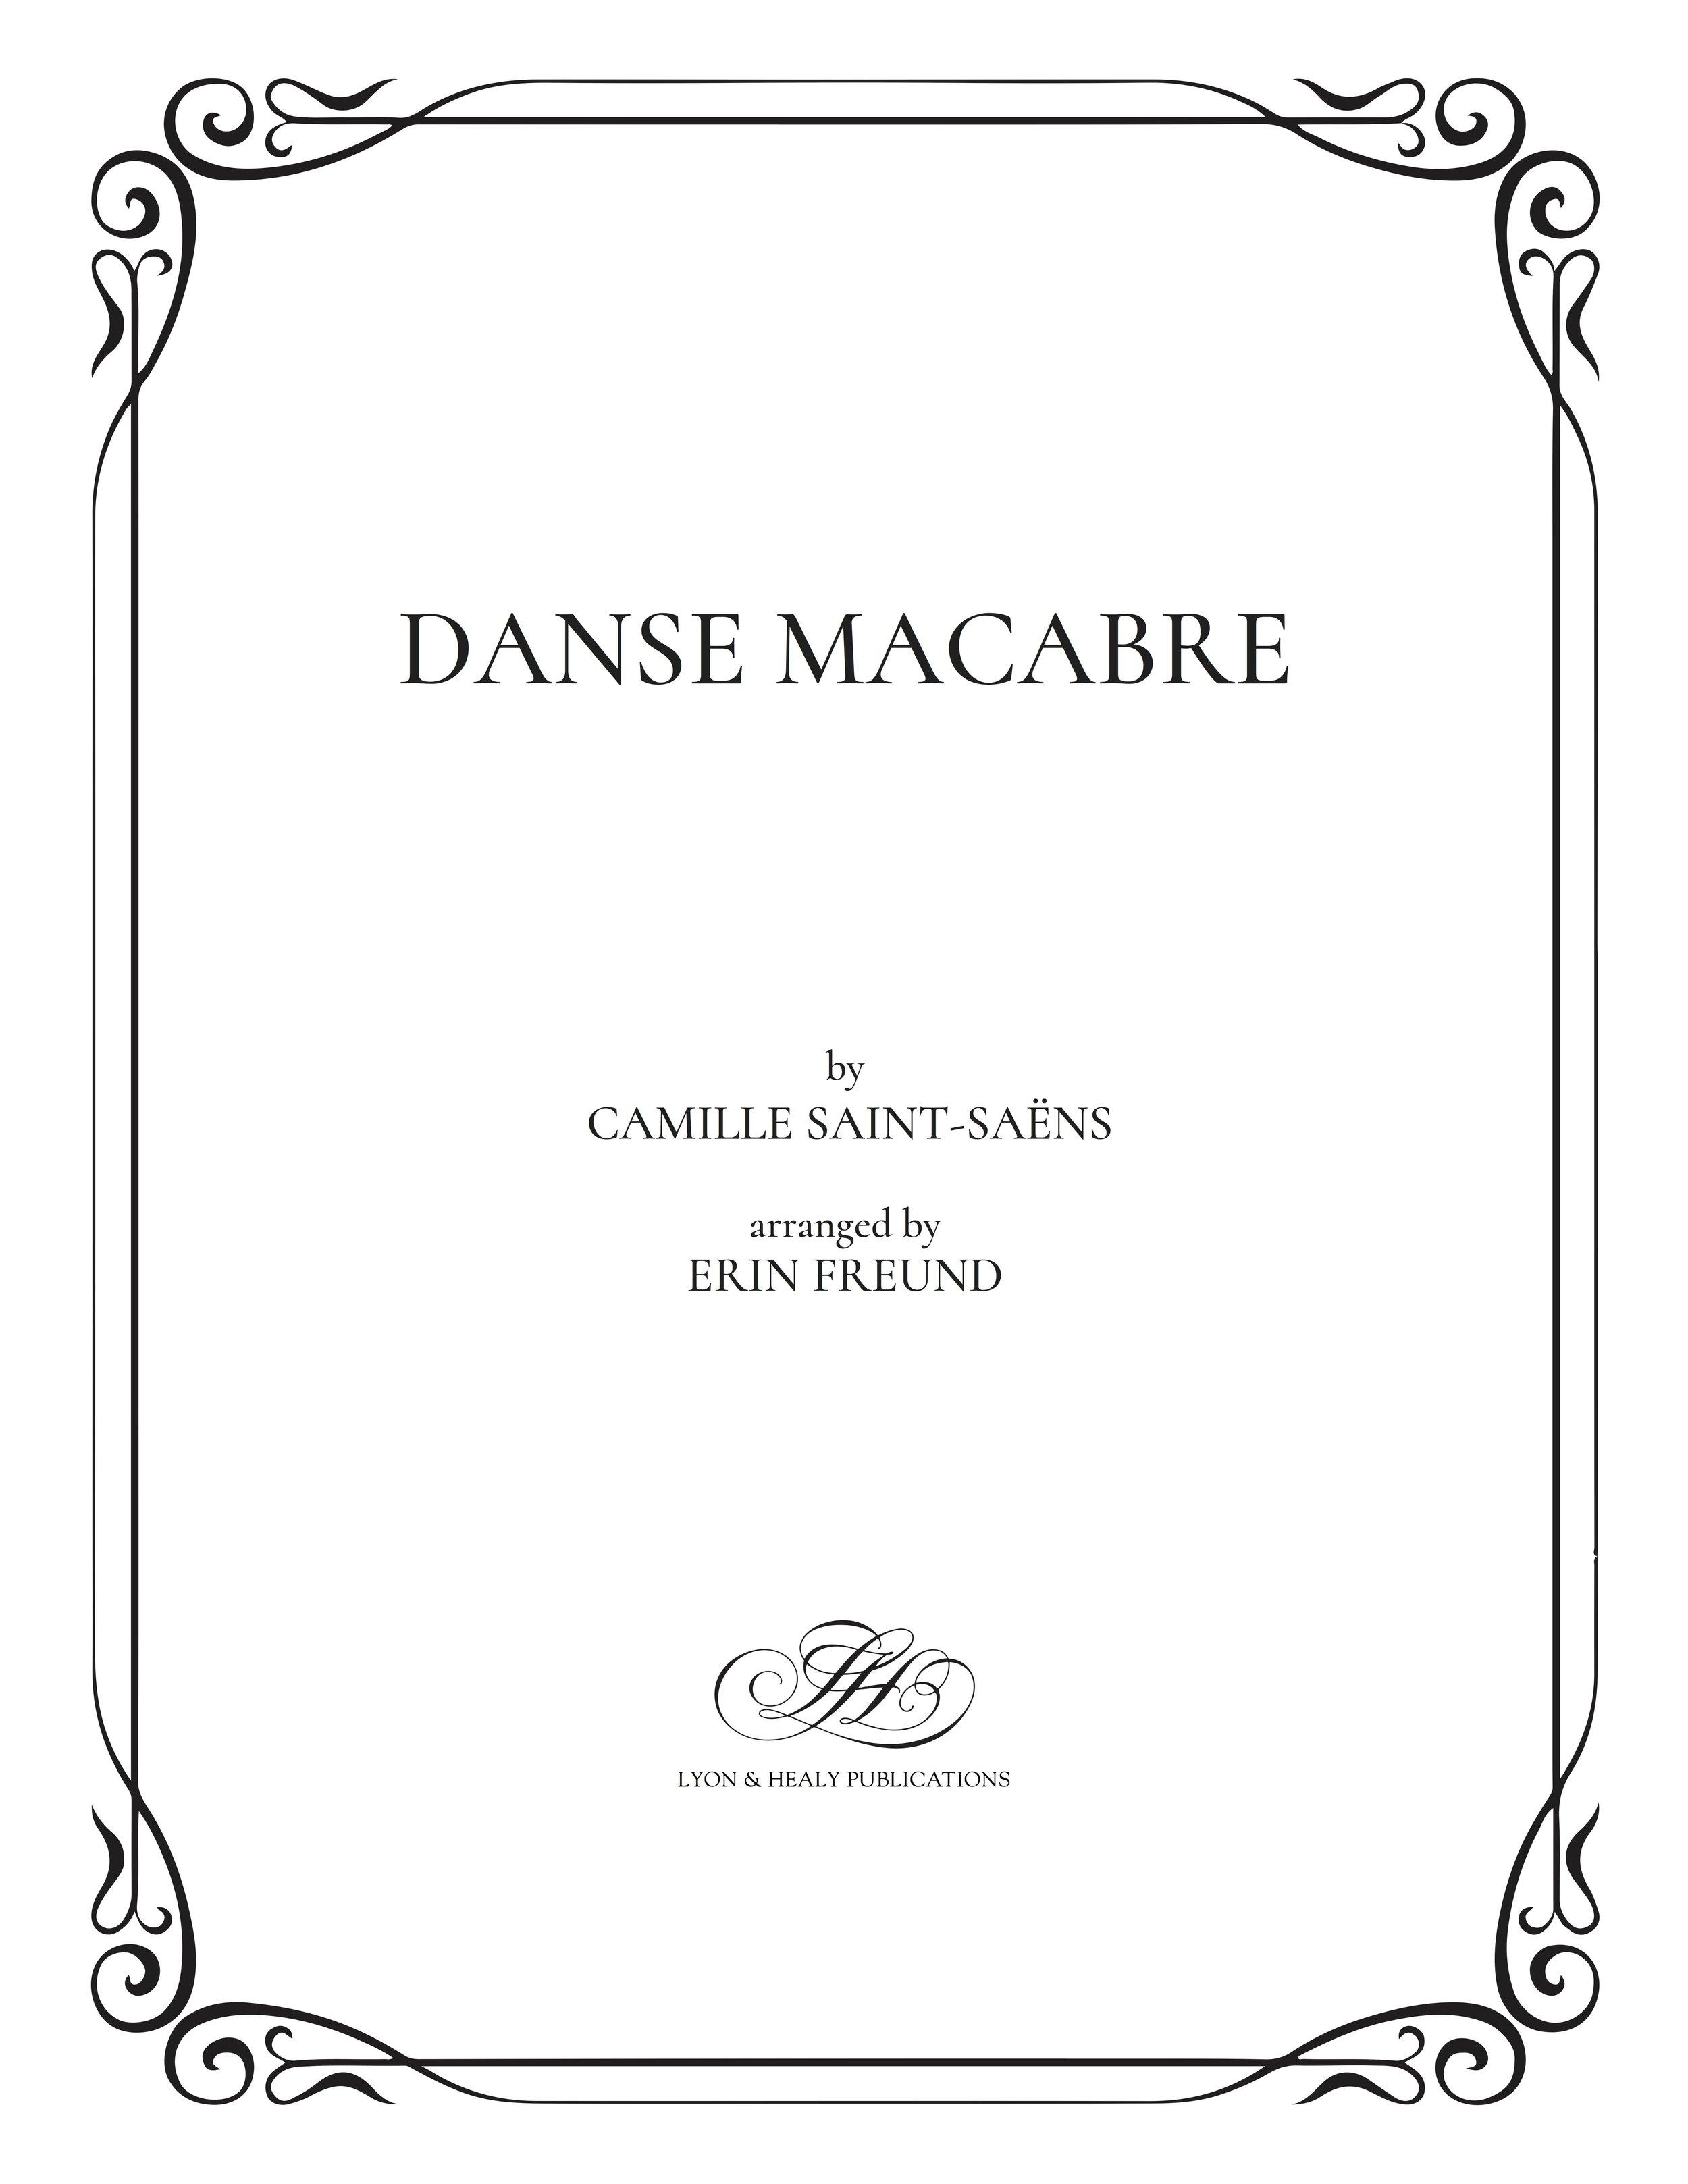 Danse Macabre - Saint-Saëns-Freund cover.jpg